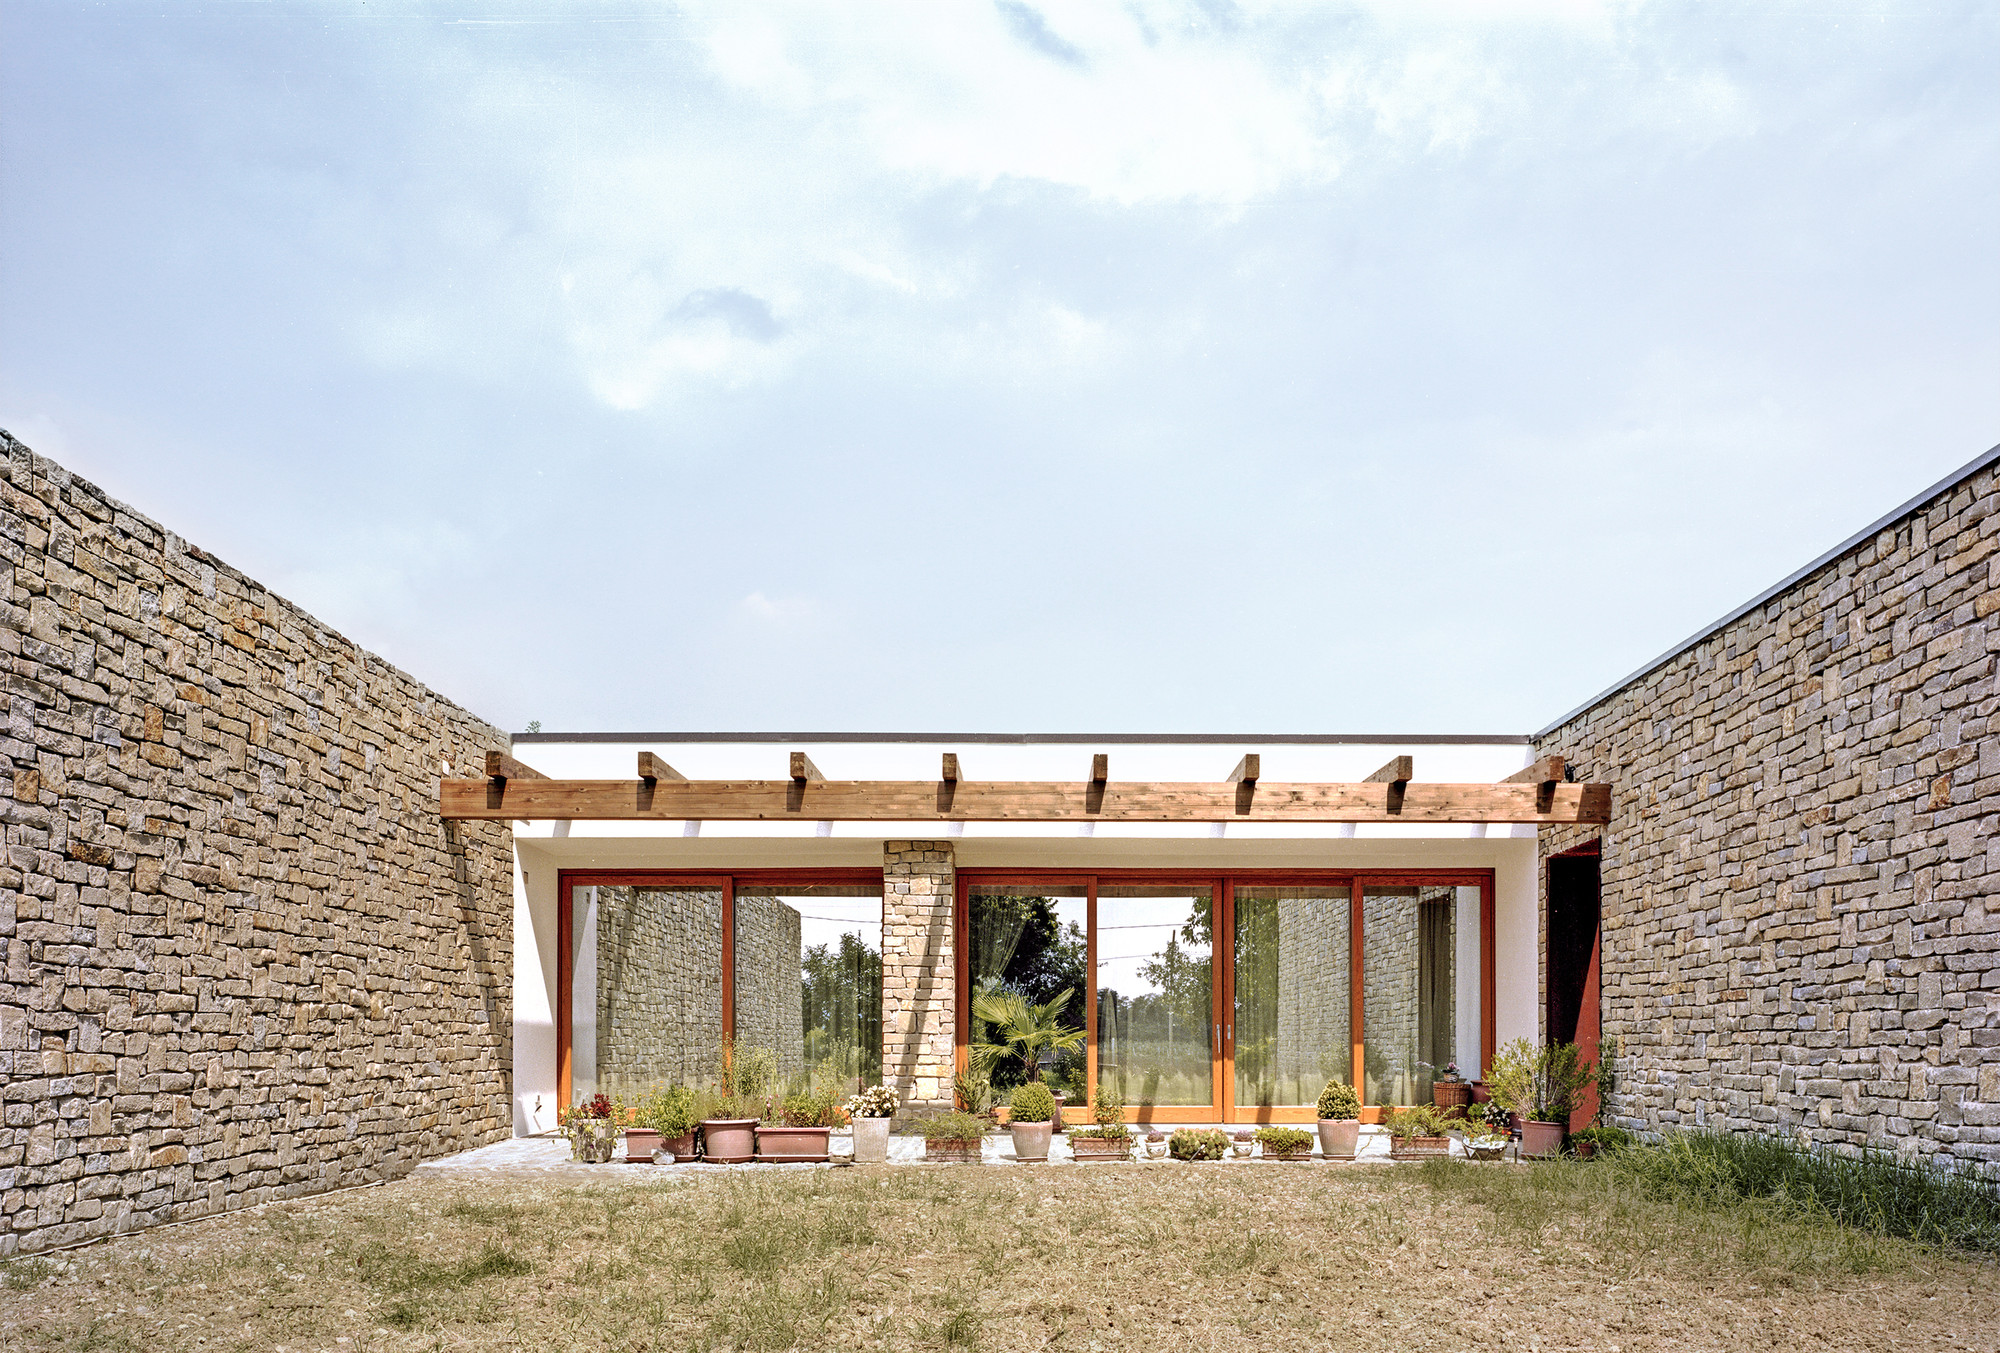 ESSE House / ellevuelle architetti, © Alvise Raimondi